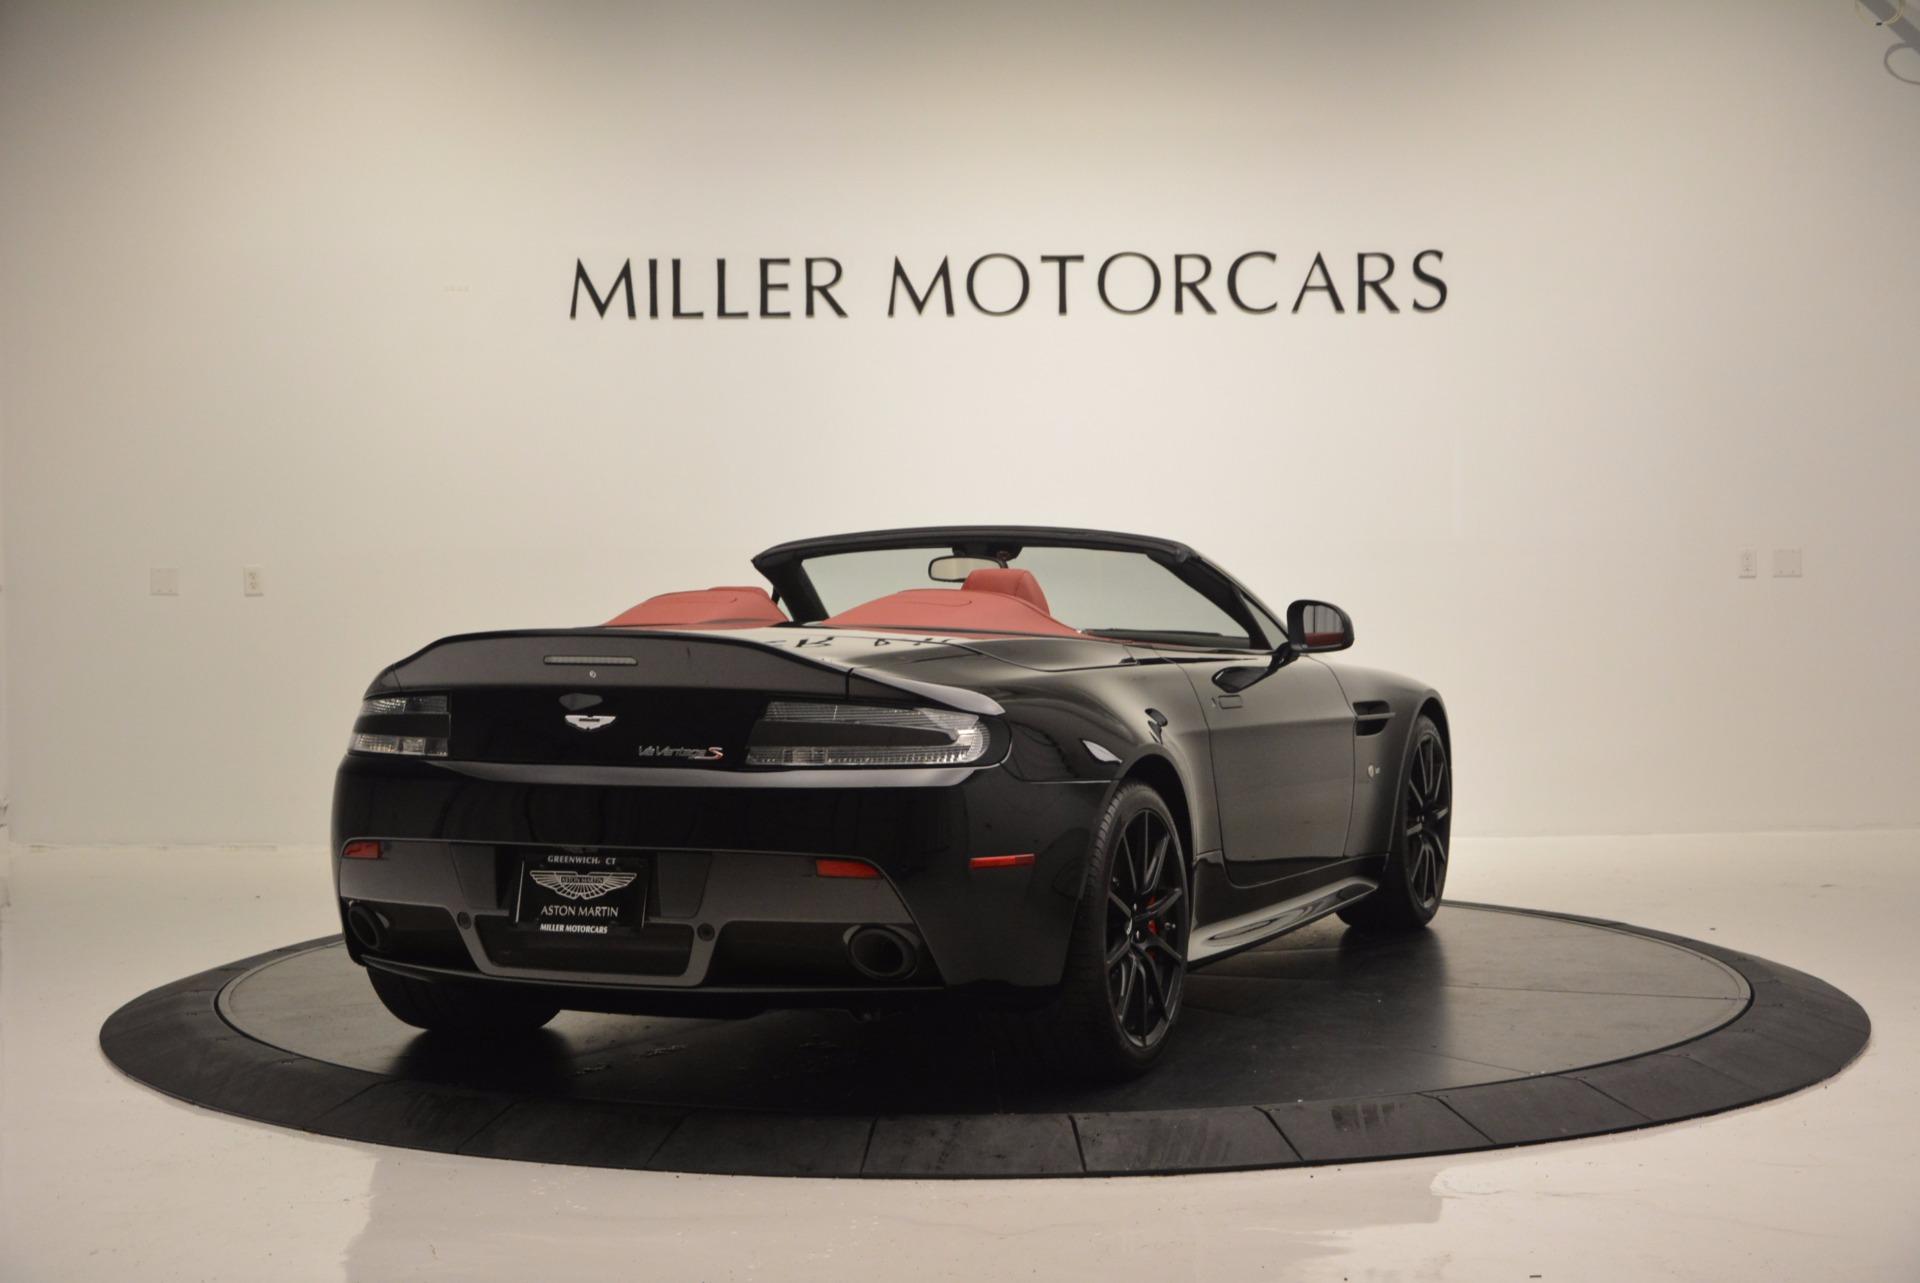 Used 2015 Aston Martin V12 Vantage S Roadster For Sale In Greenwich, CT. Alfa Romeo of Greenwich, 7227 1335_p7